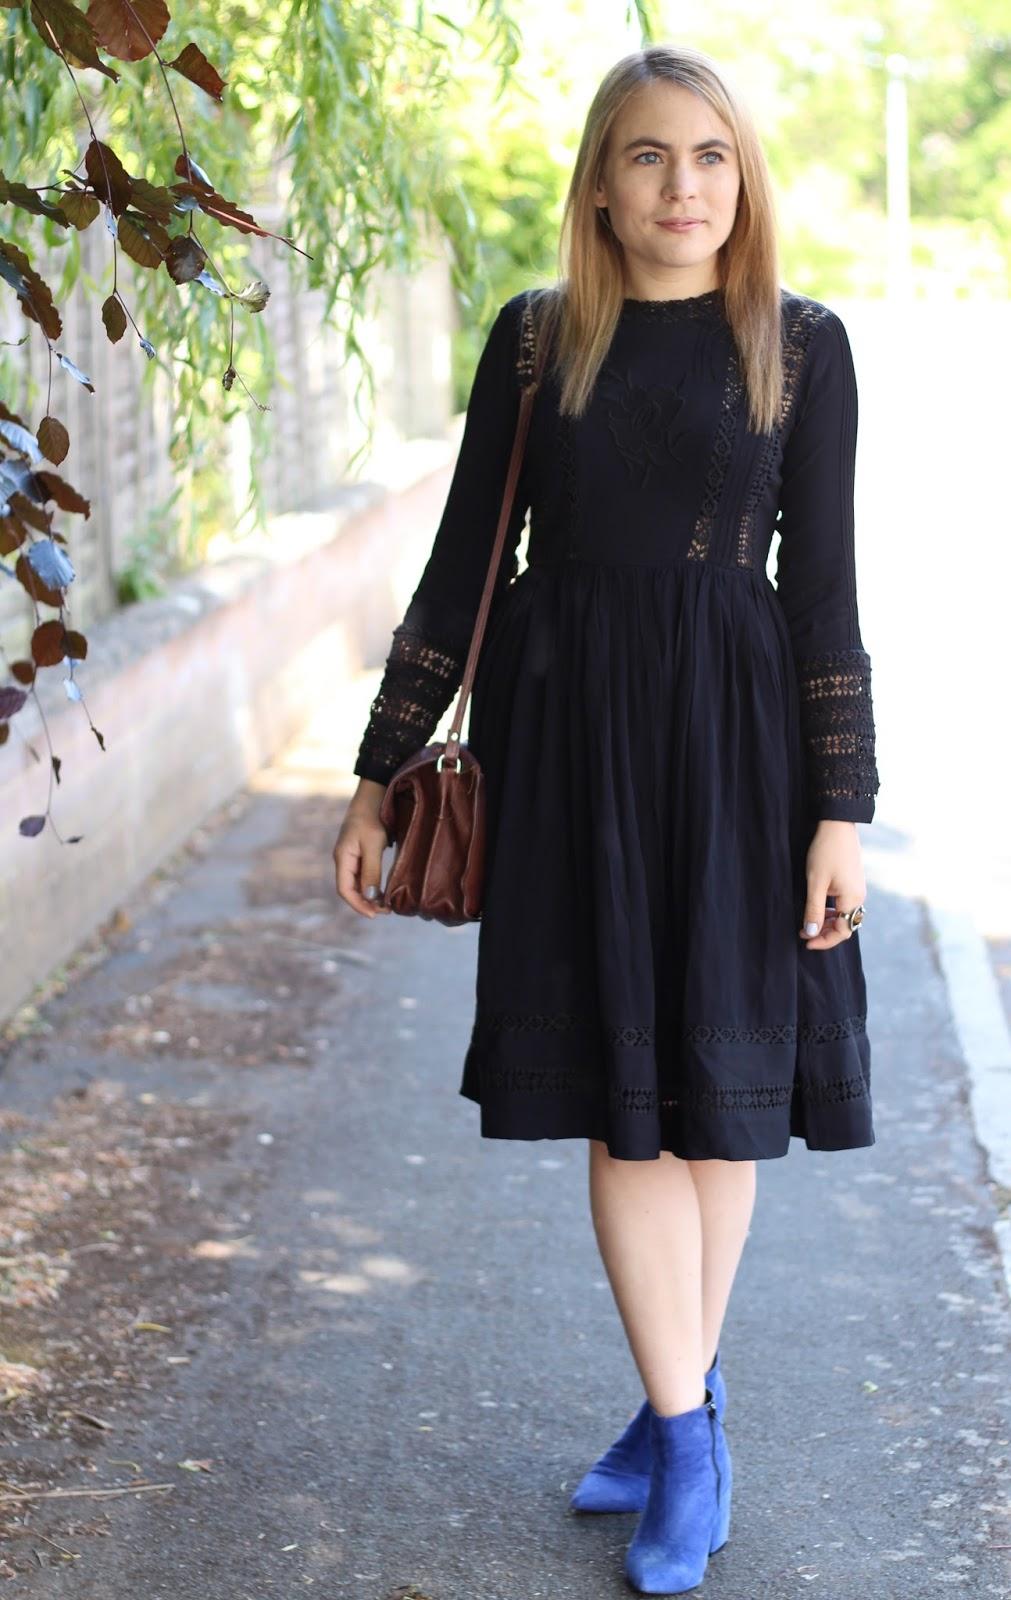 ASOS Crochet Dress